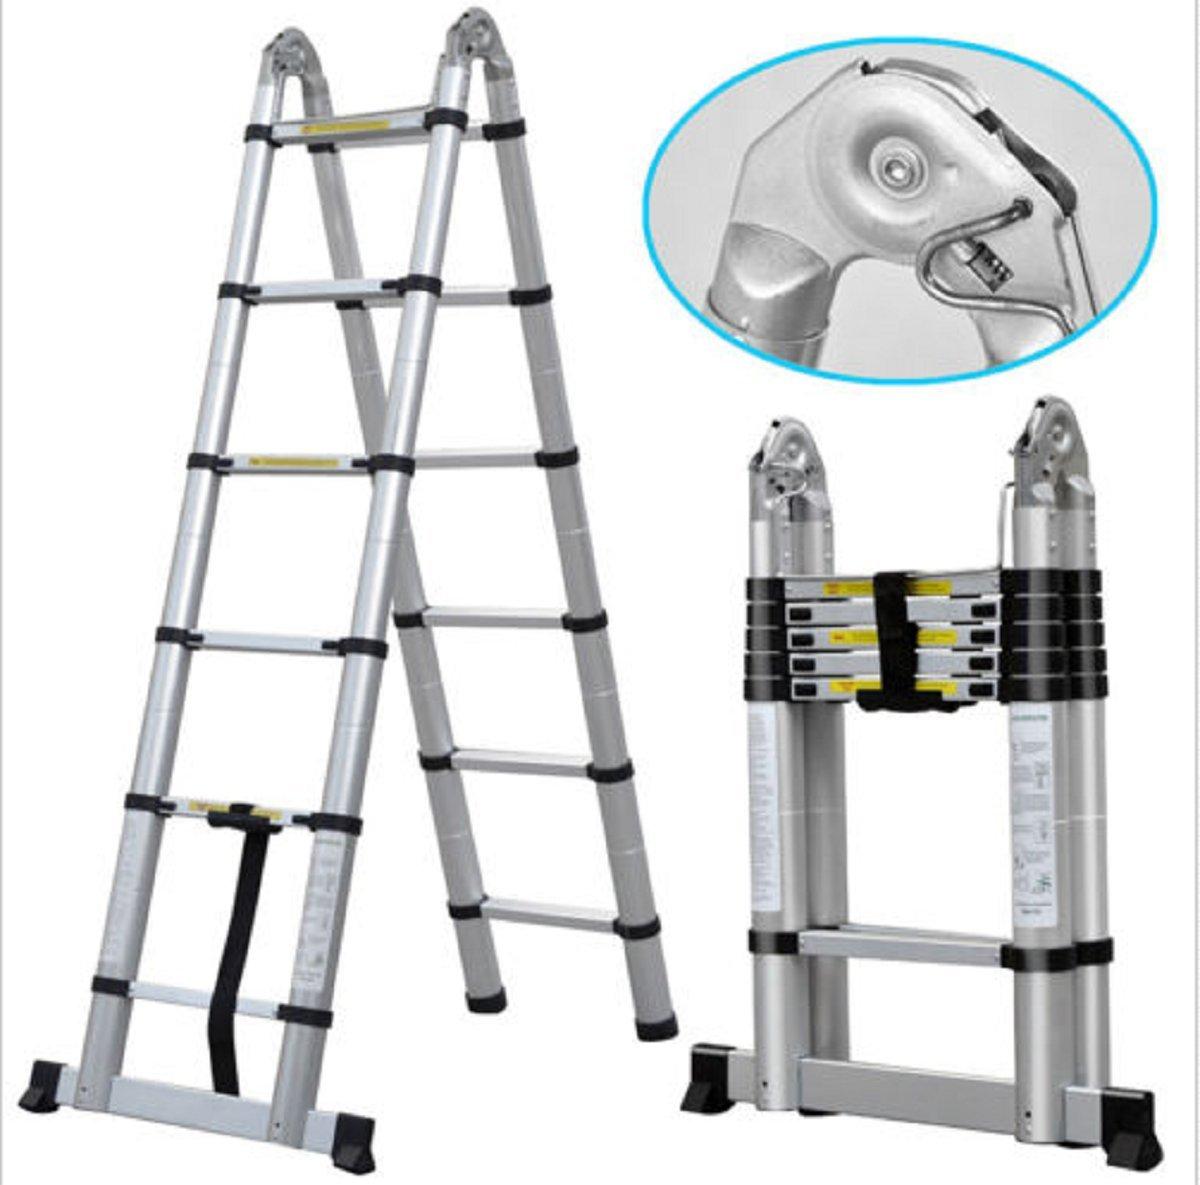 USA Premium Store 12.5FT Aluminum Extension Fully Extendable Telescopic Ladder Multi-purpose by USA Premium Store